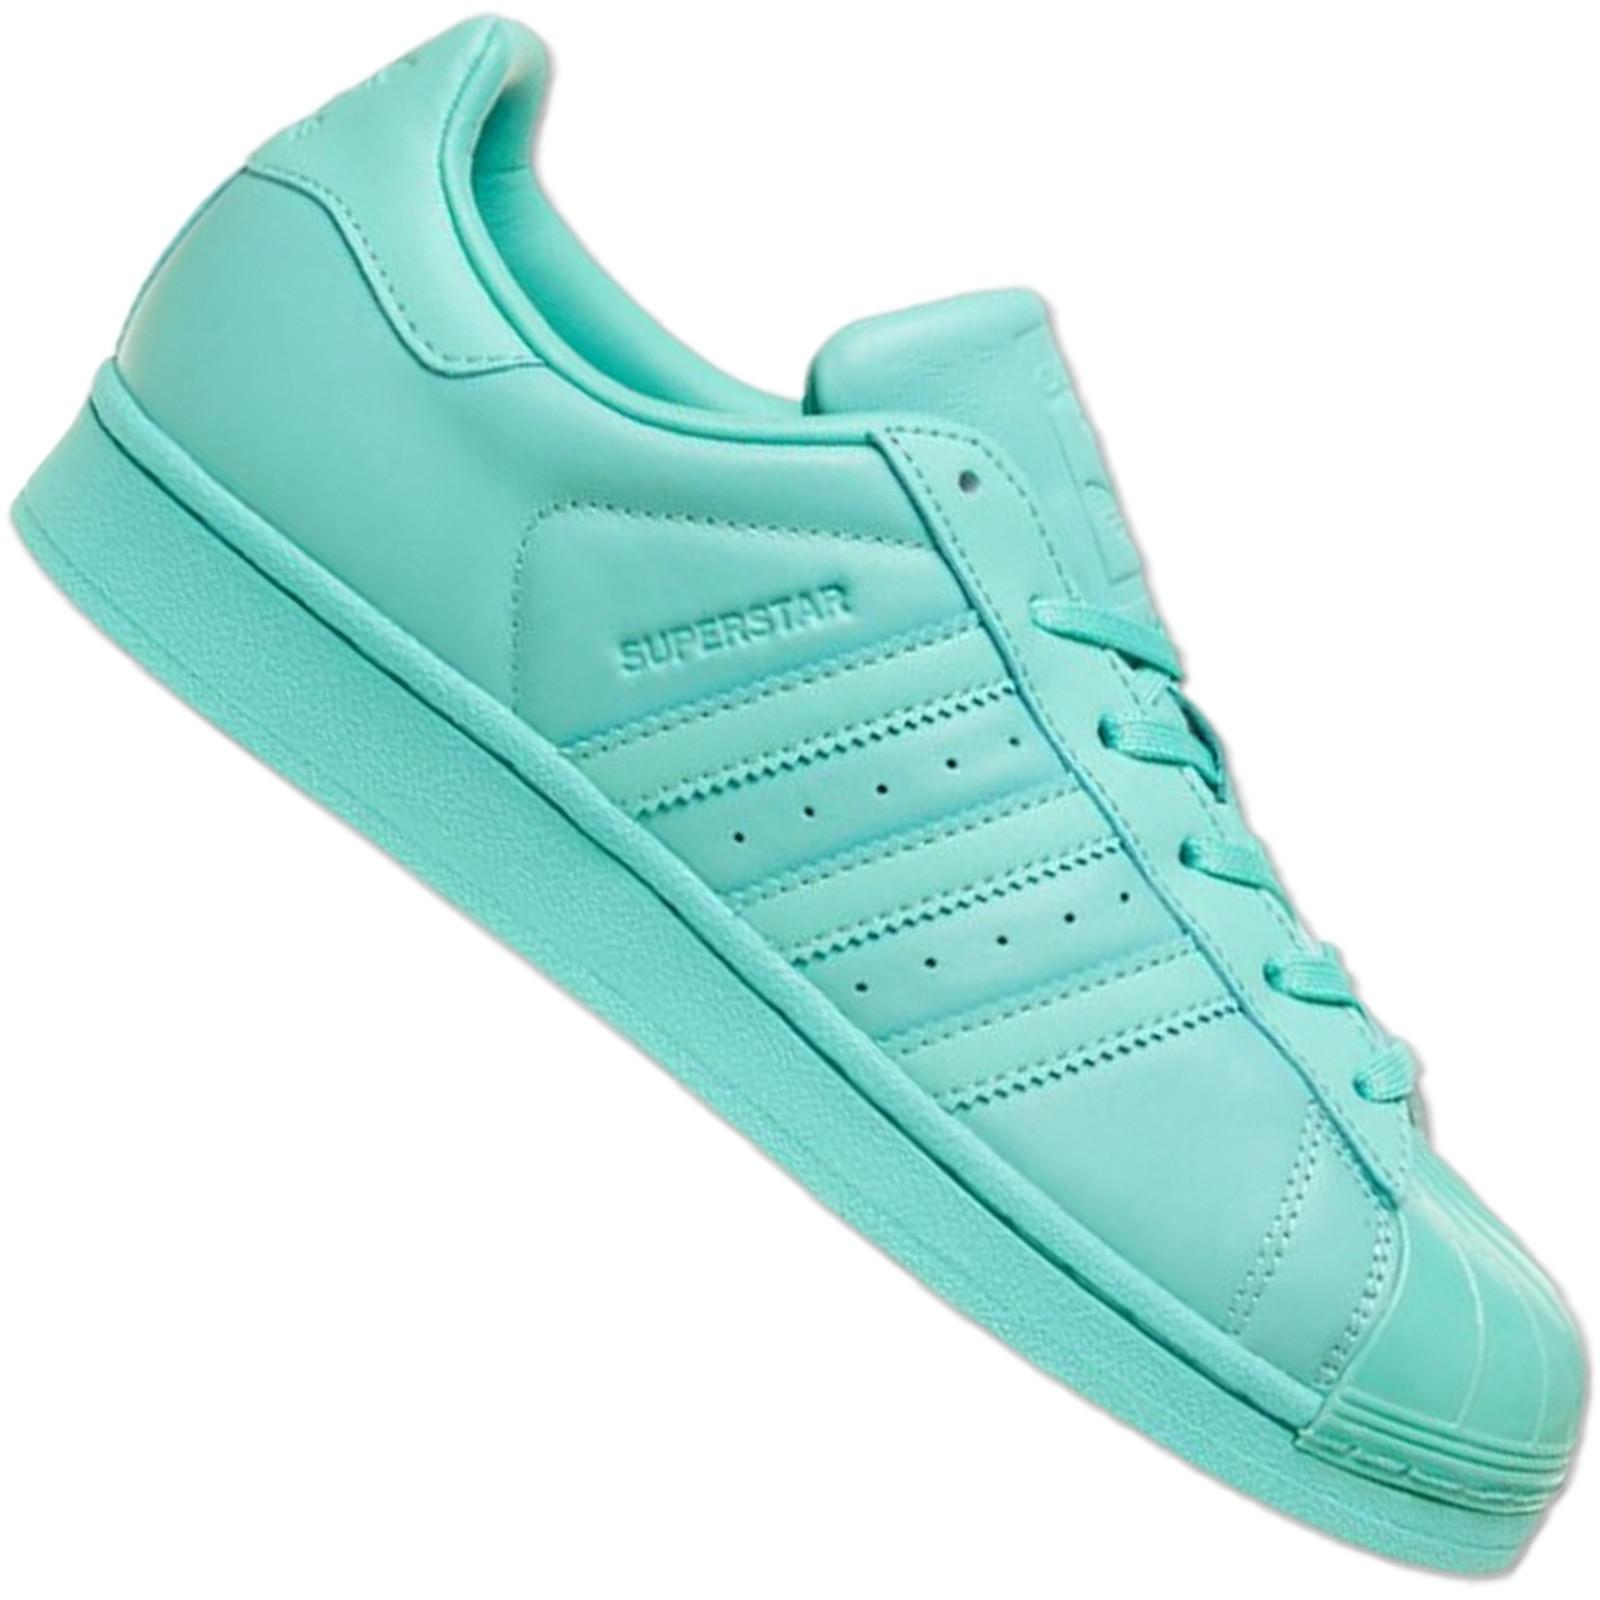 Schuhe Superstar Leder Adidas Damen Sneaker Sst Herren Turnschuhe Originals OXluwPkZTi